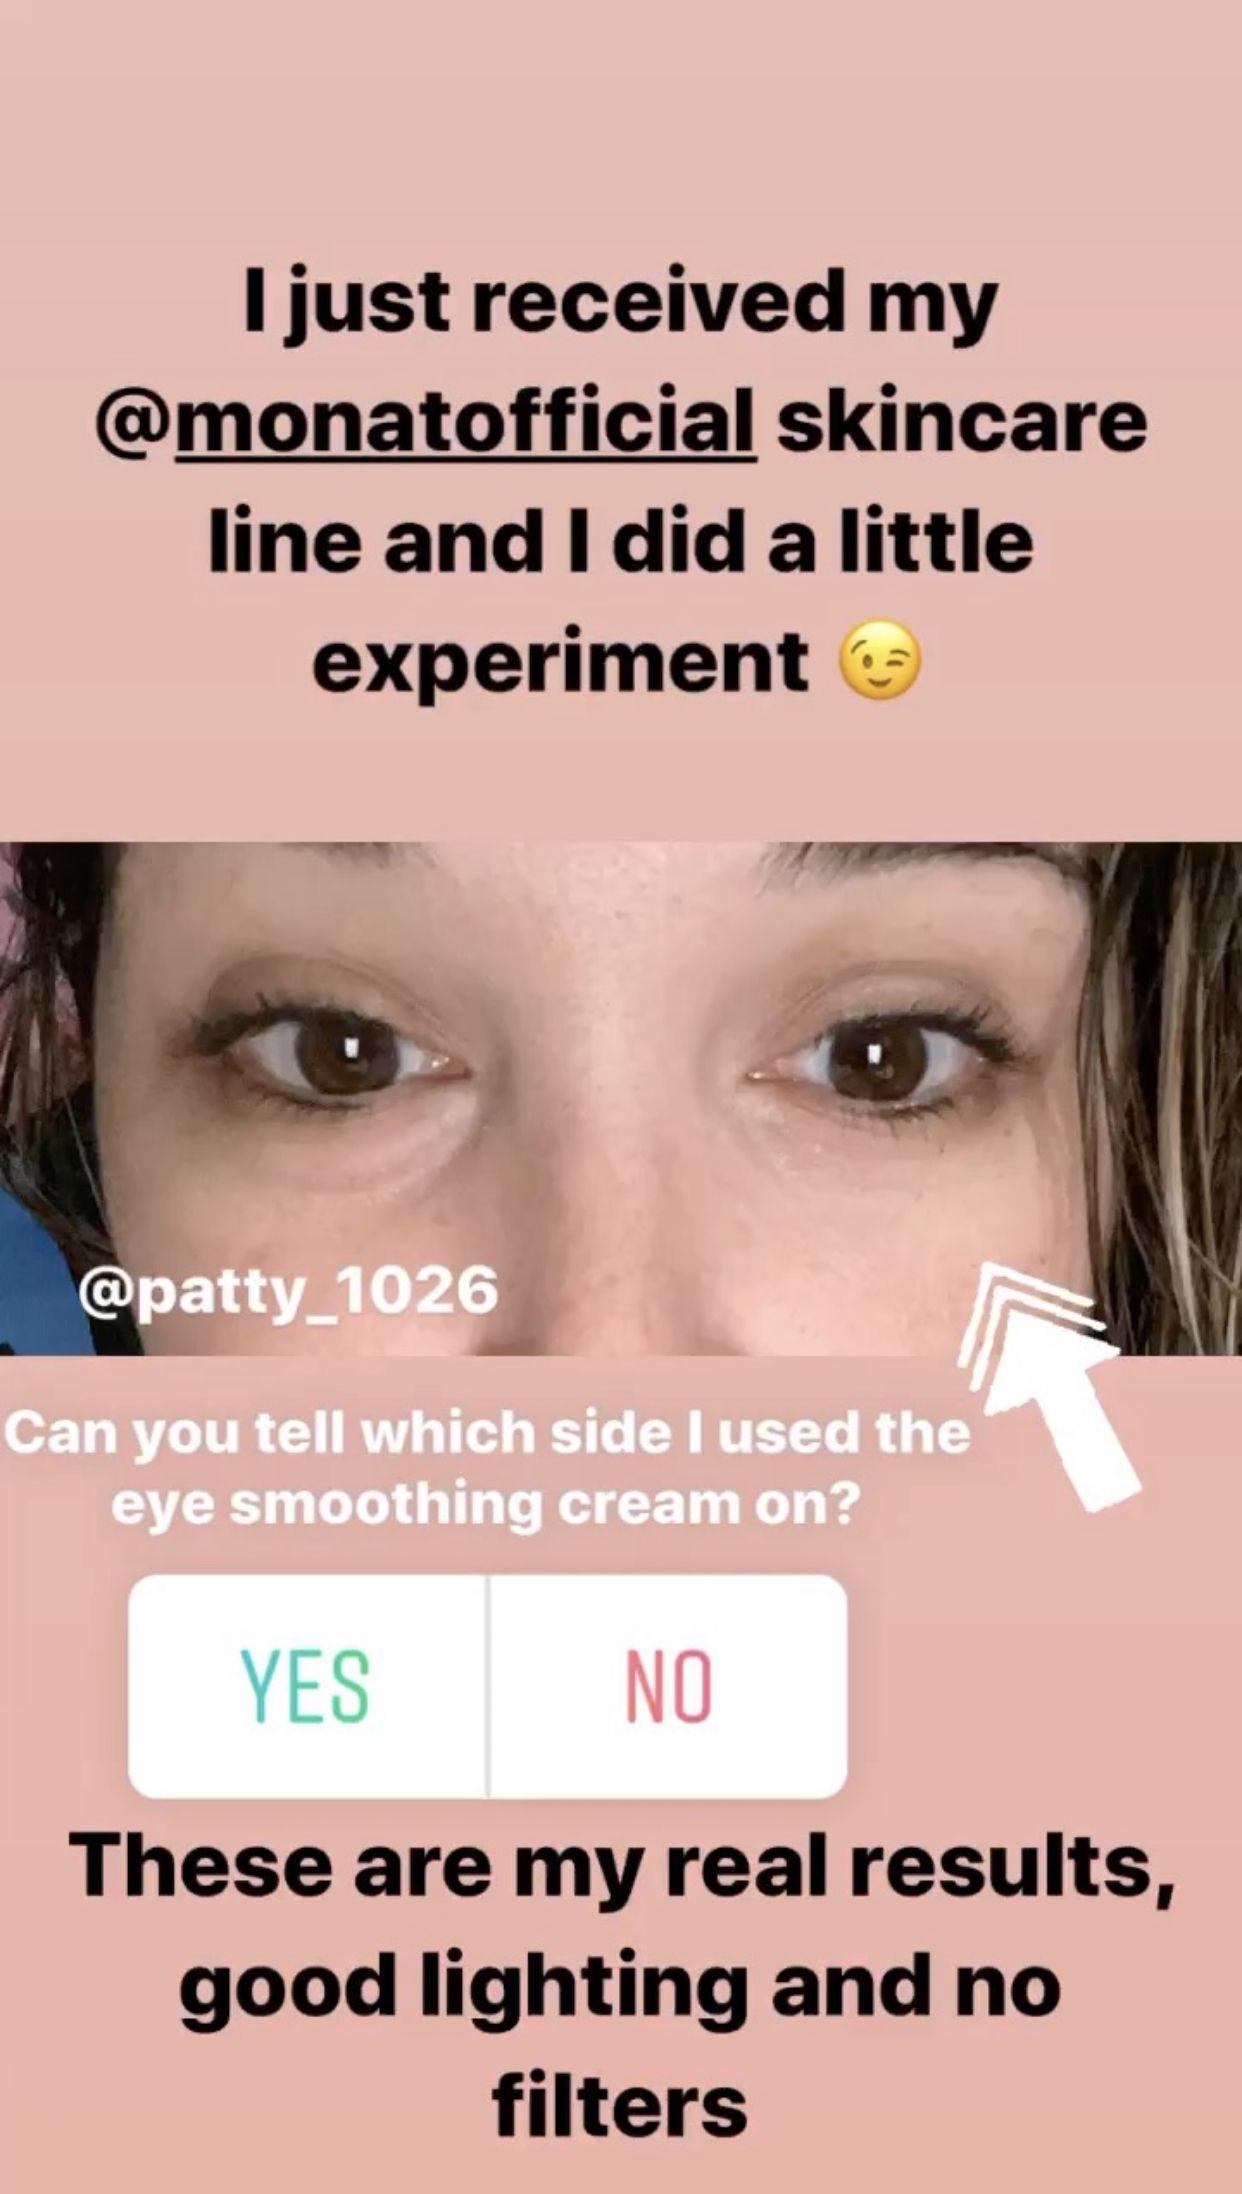 Monat Skin Eye Smoothing Cream Results Monat Hair Smoothing Cream Monat